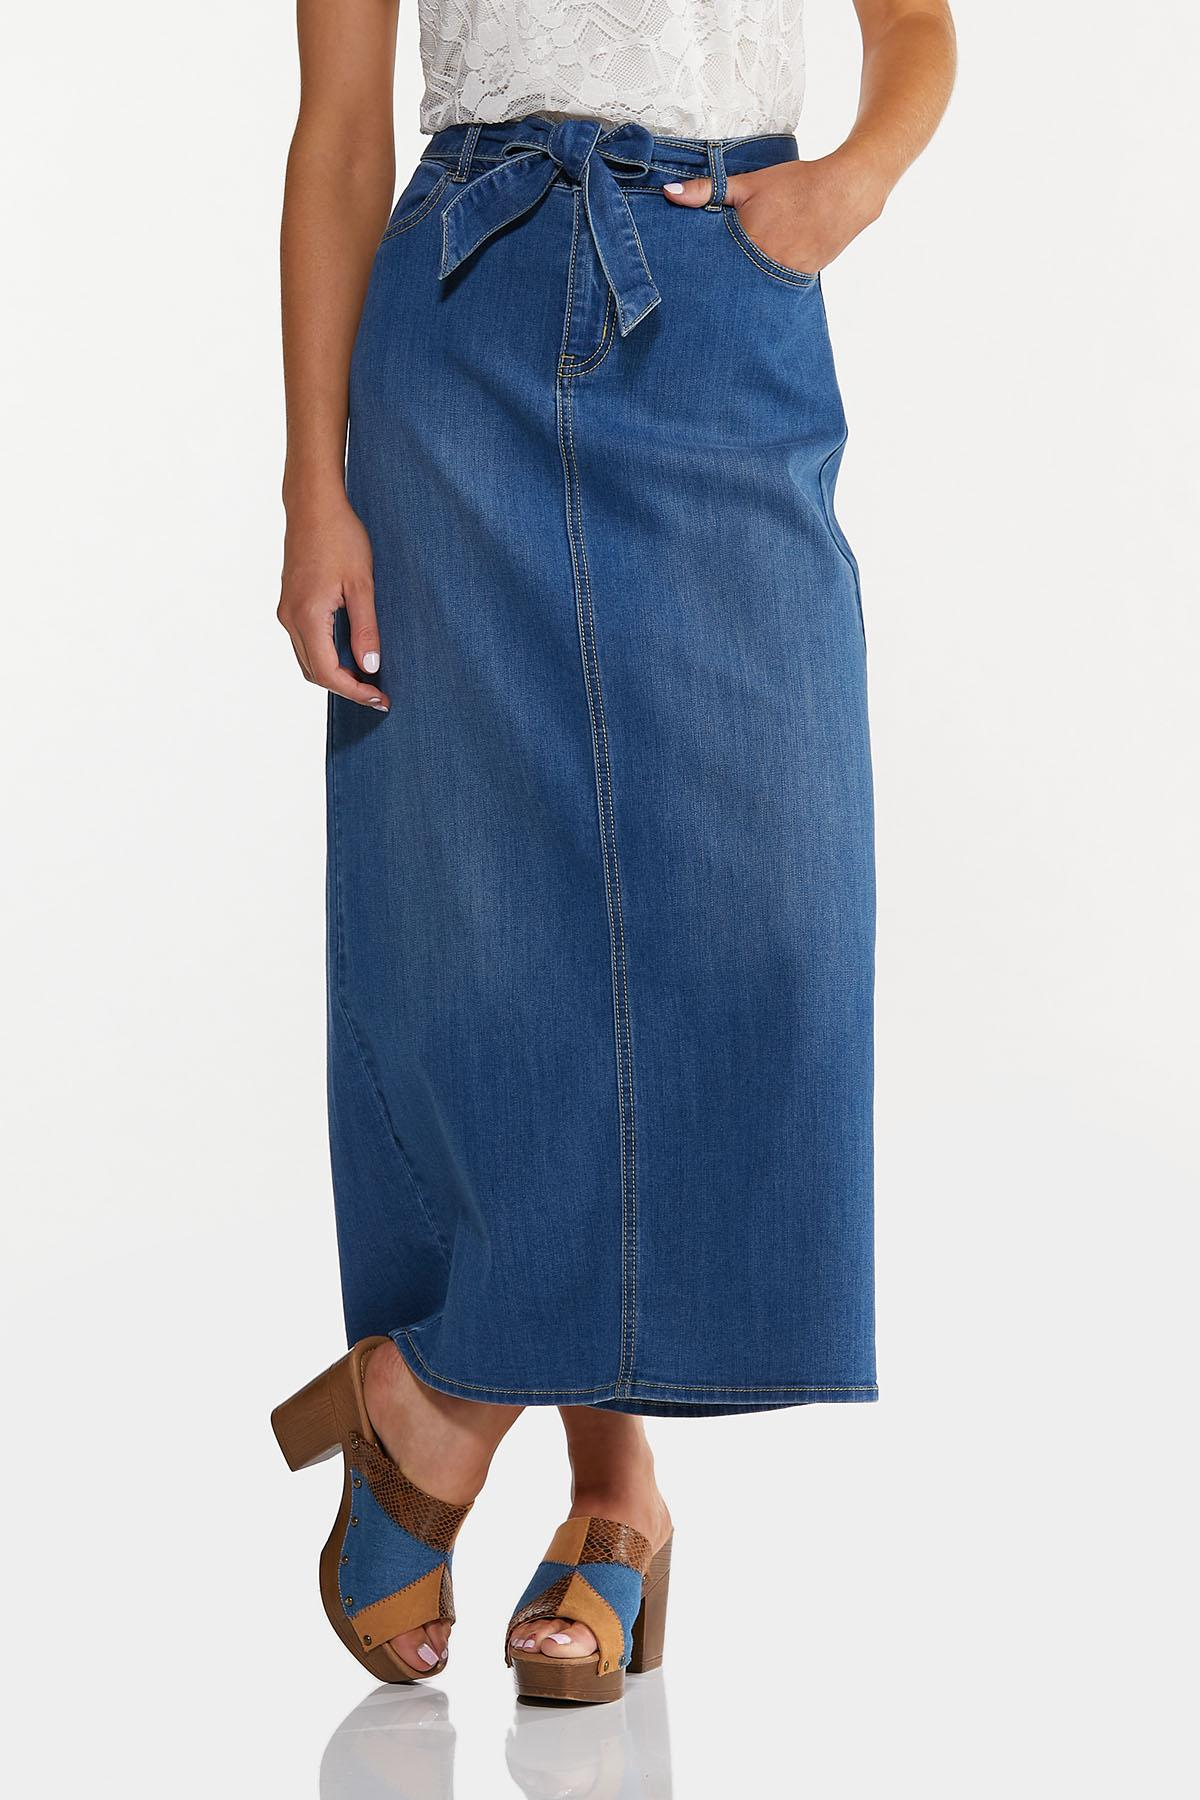 Denim Tie Waist Maxi Skirt